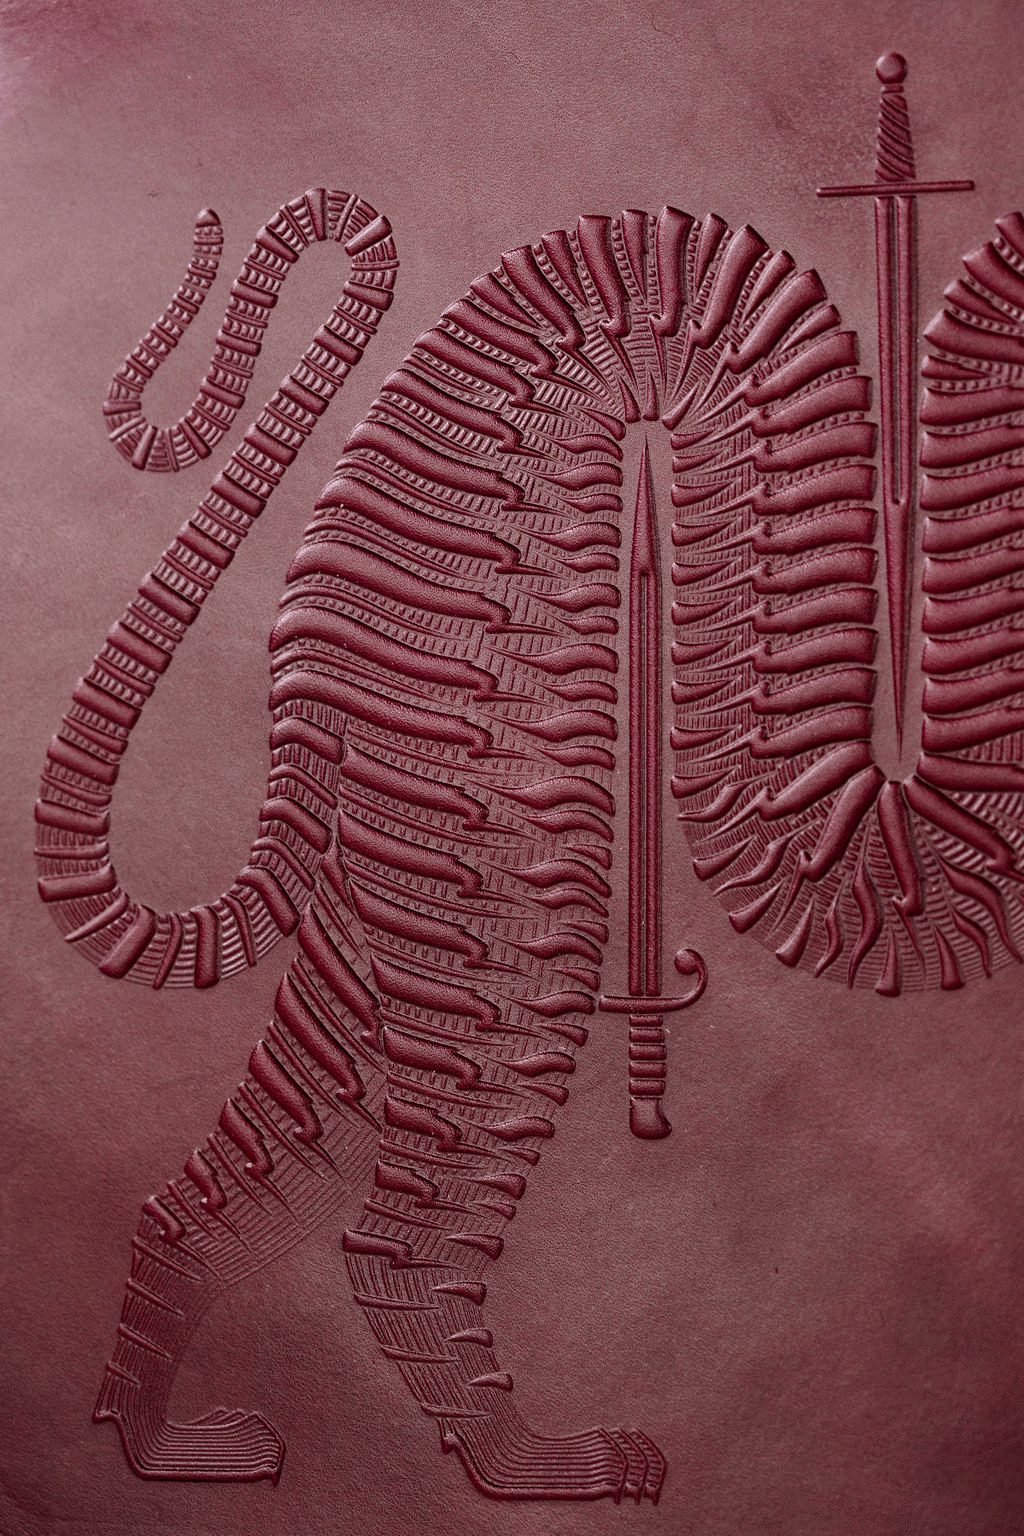 Folio-animal-handmade-oxblood-zipper-folio-bag-2.png